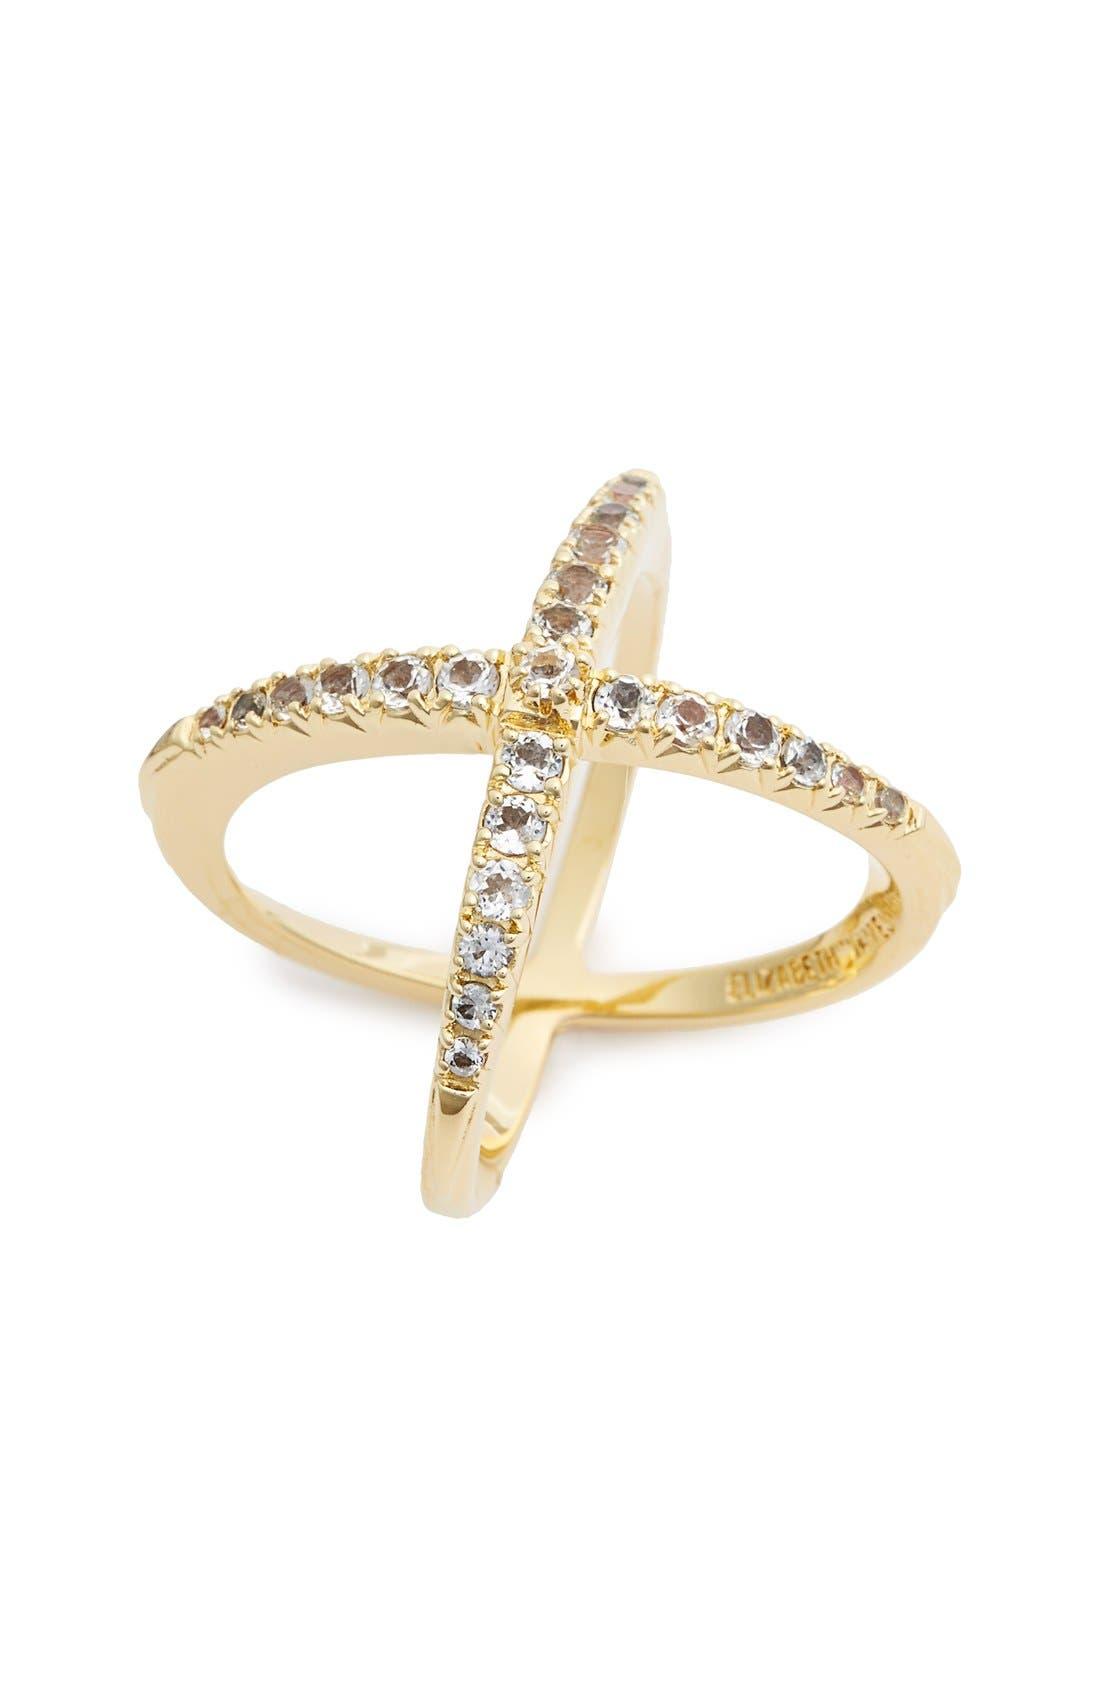 Alternate Image 1 Selected - Elizabeth and James 'Windrose' Pavé White Topaz Ring